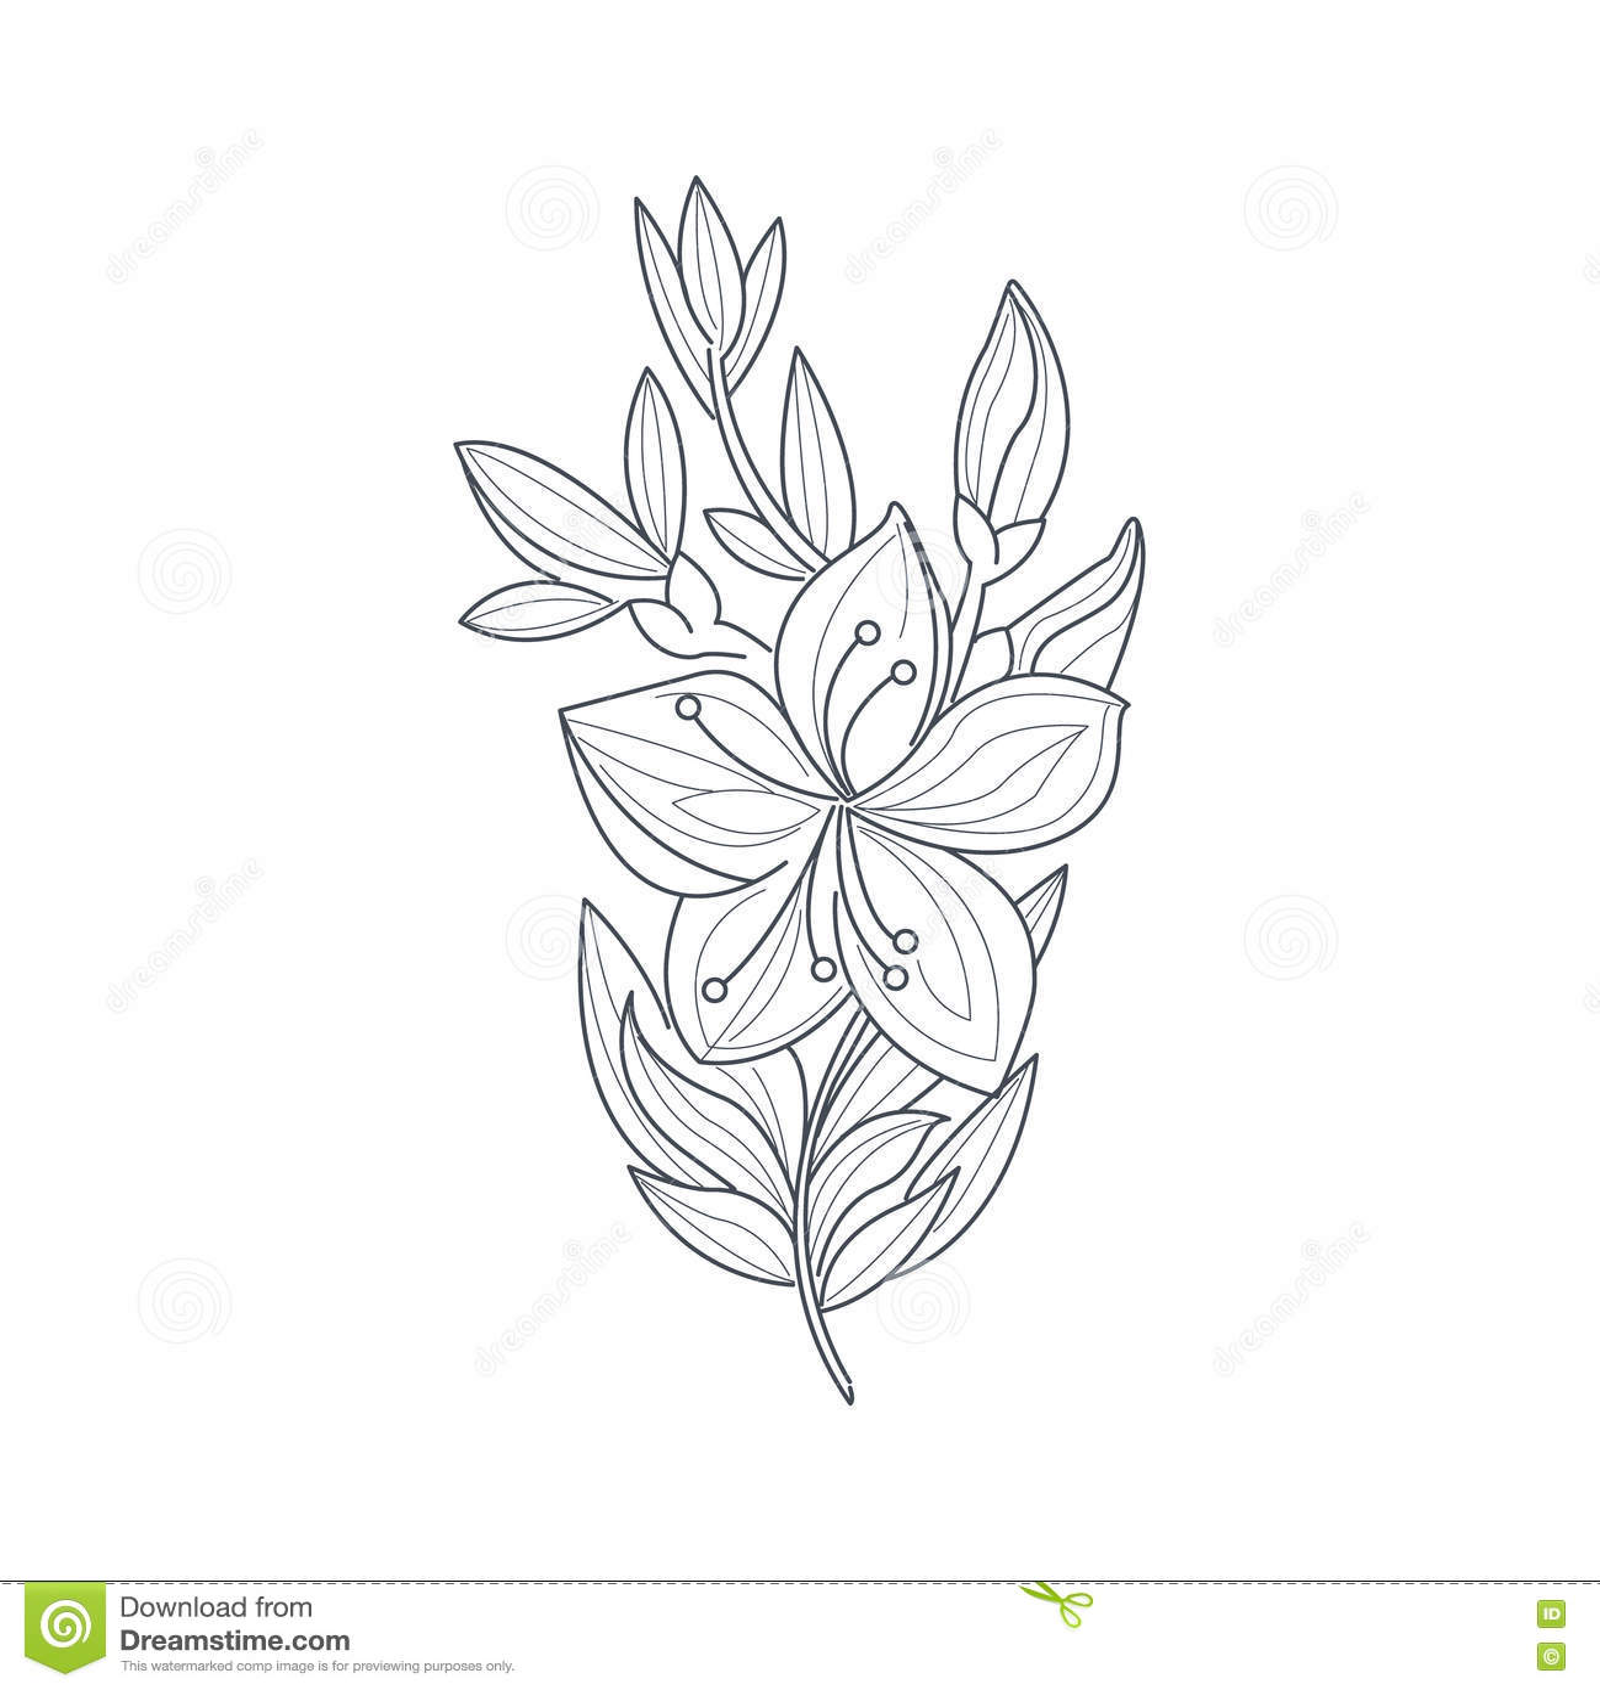 Libro De Colorear De Jasmine Flower Monochrome Drawing For ...